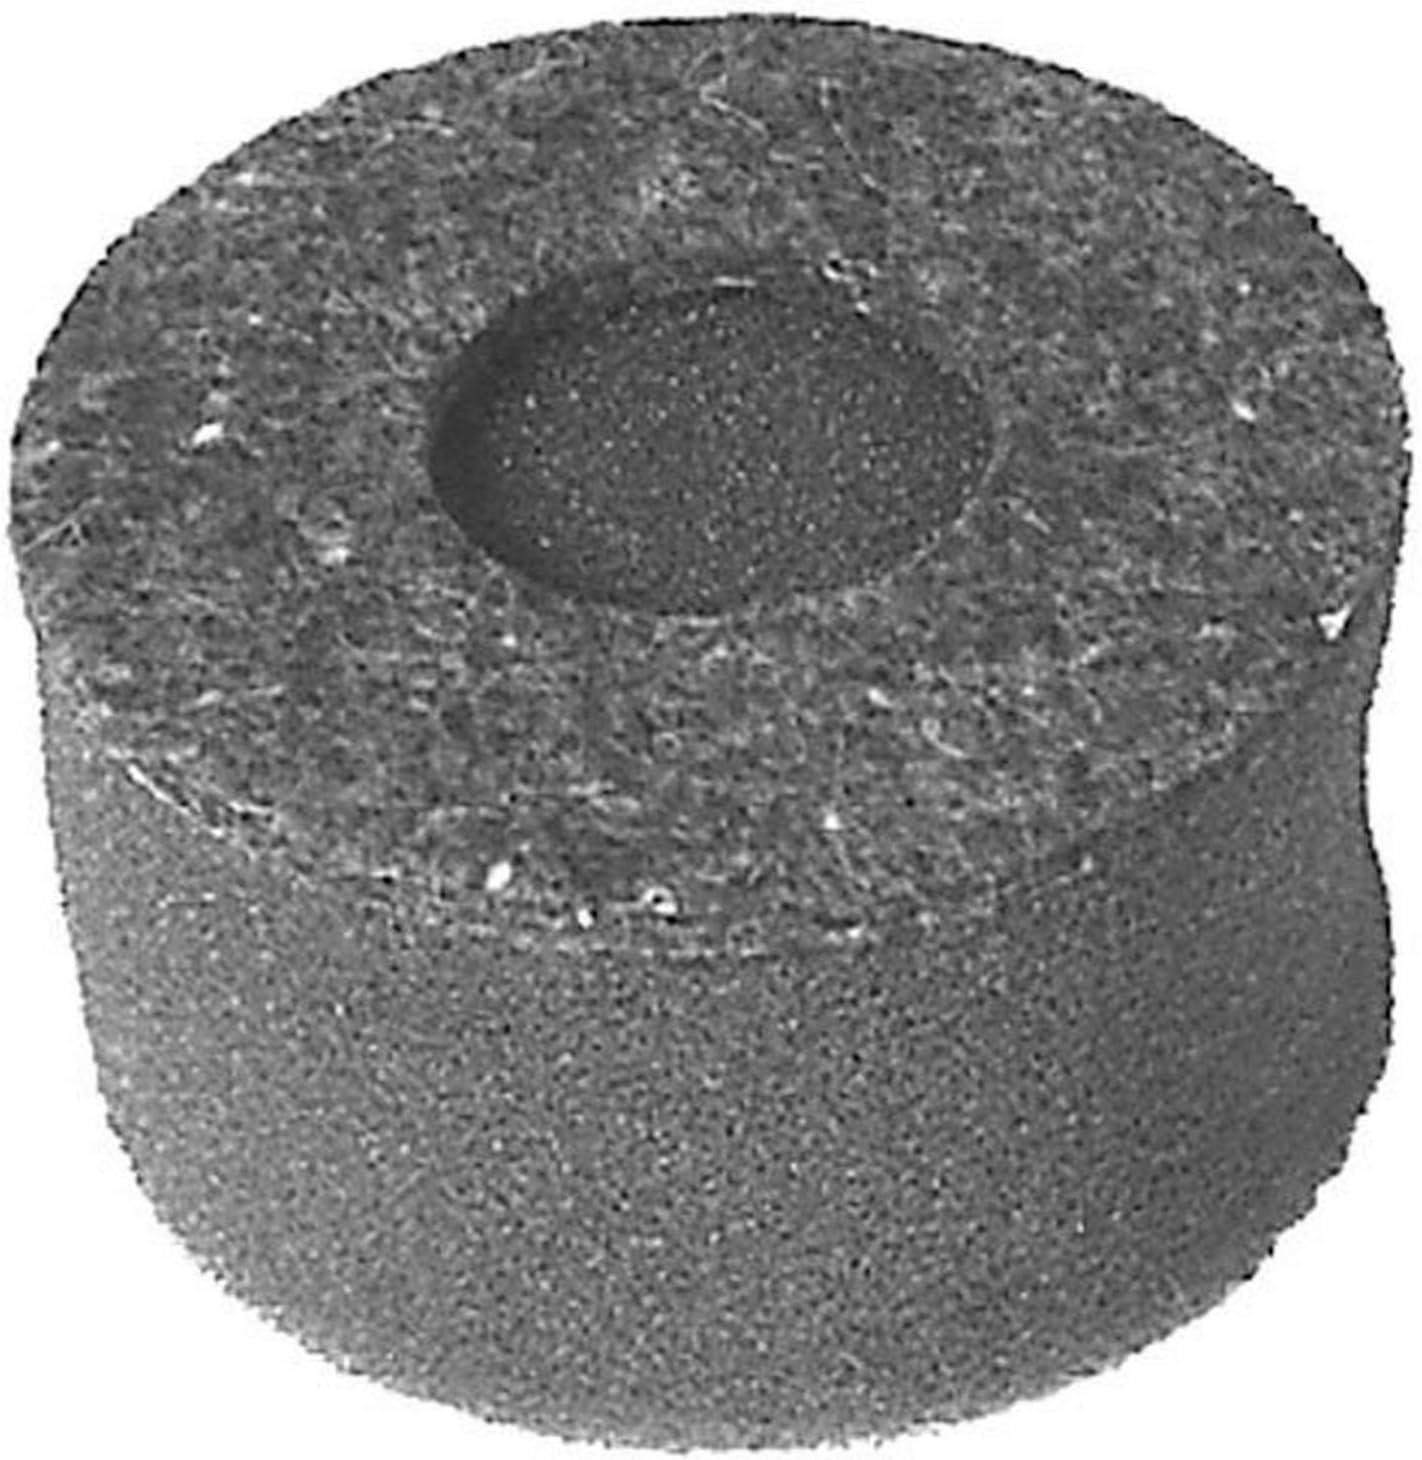 Oregon 30-205 Foam Air Filter Tecumseh 31700 3-1//2-inch Diameter Height of 2-3//16-inches